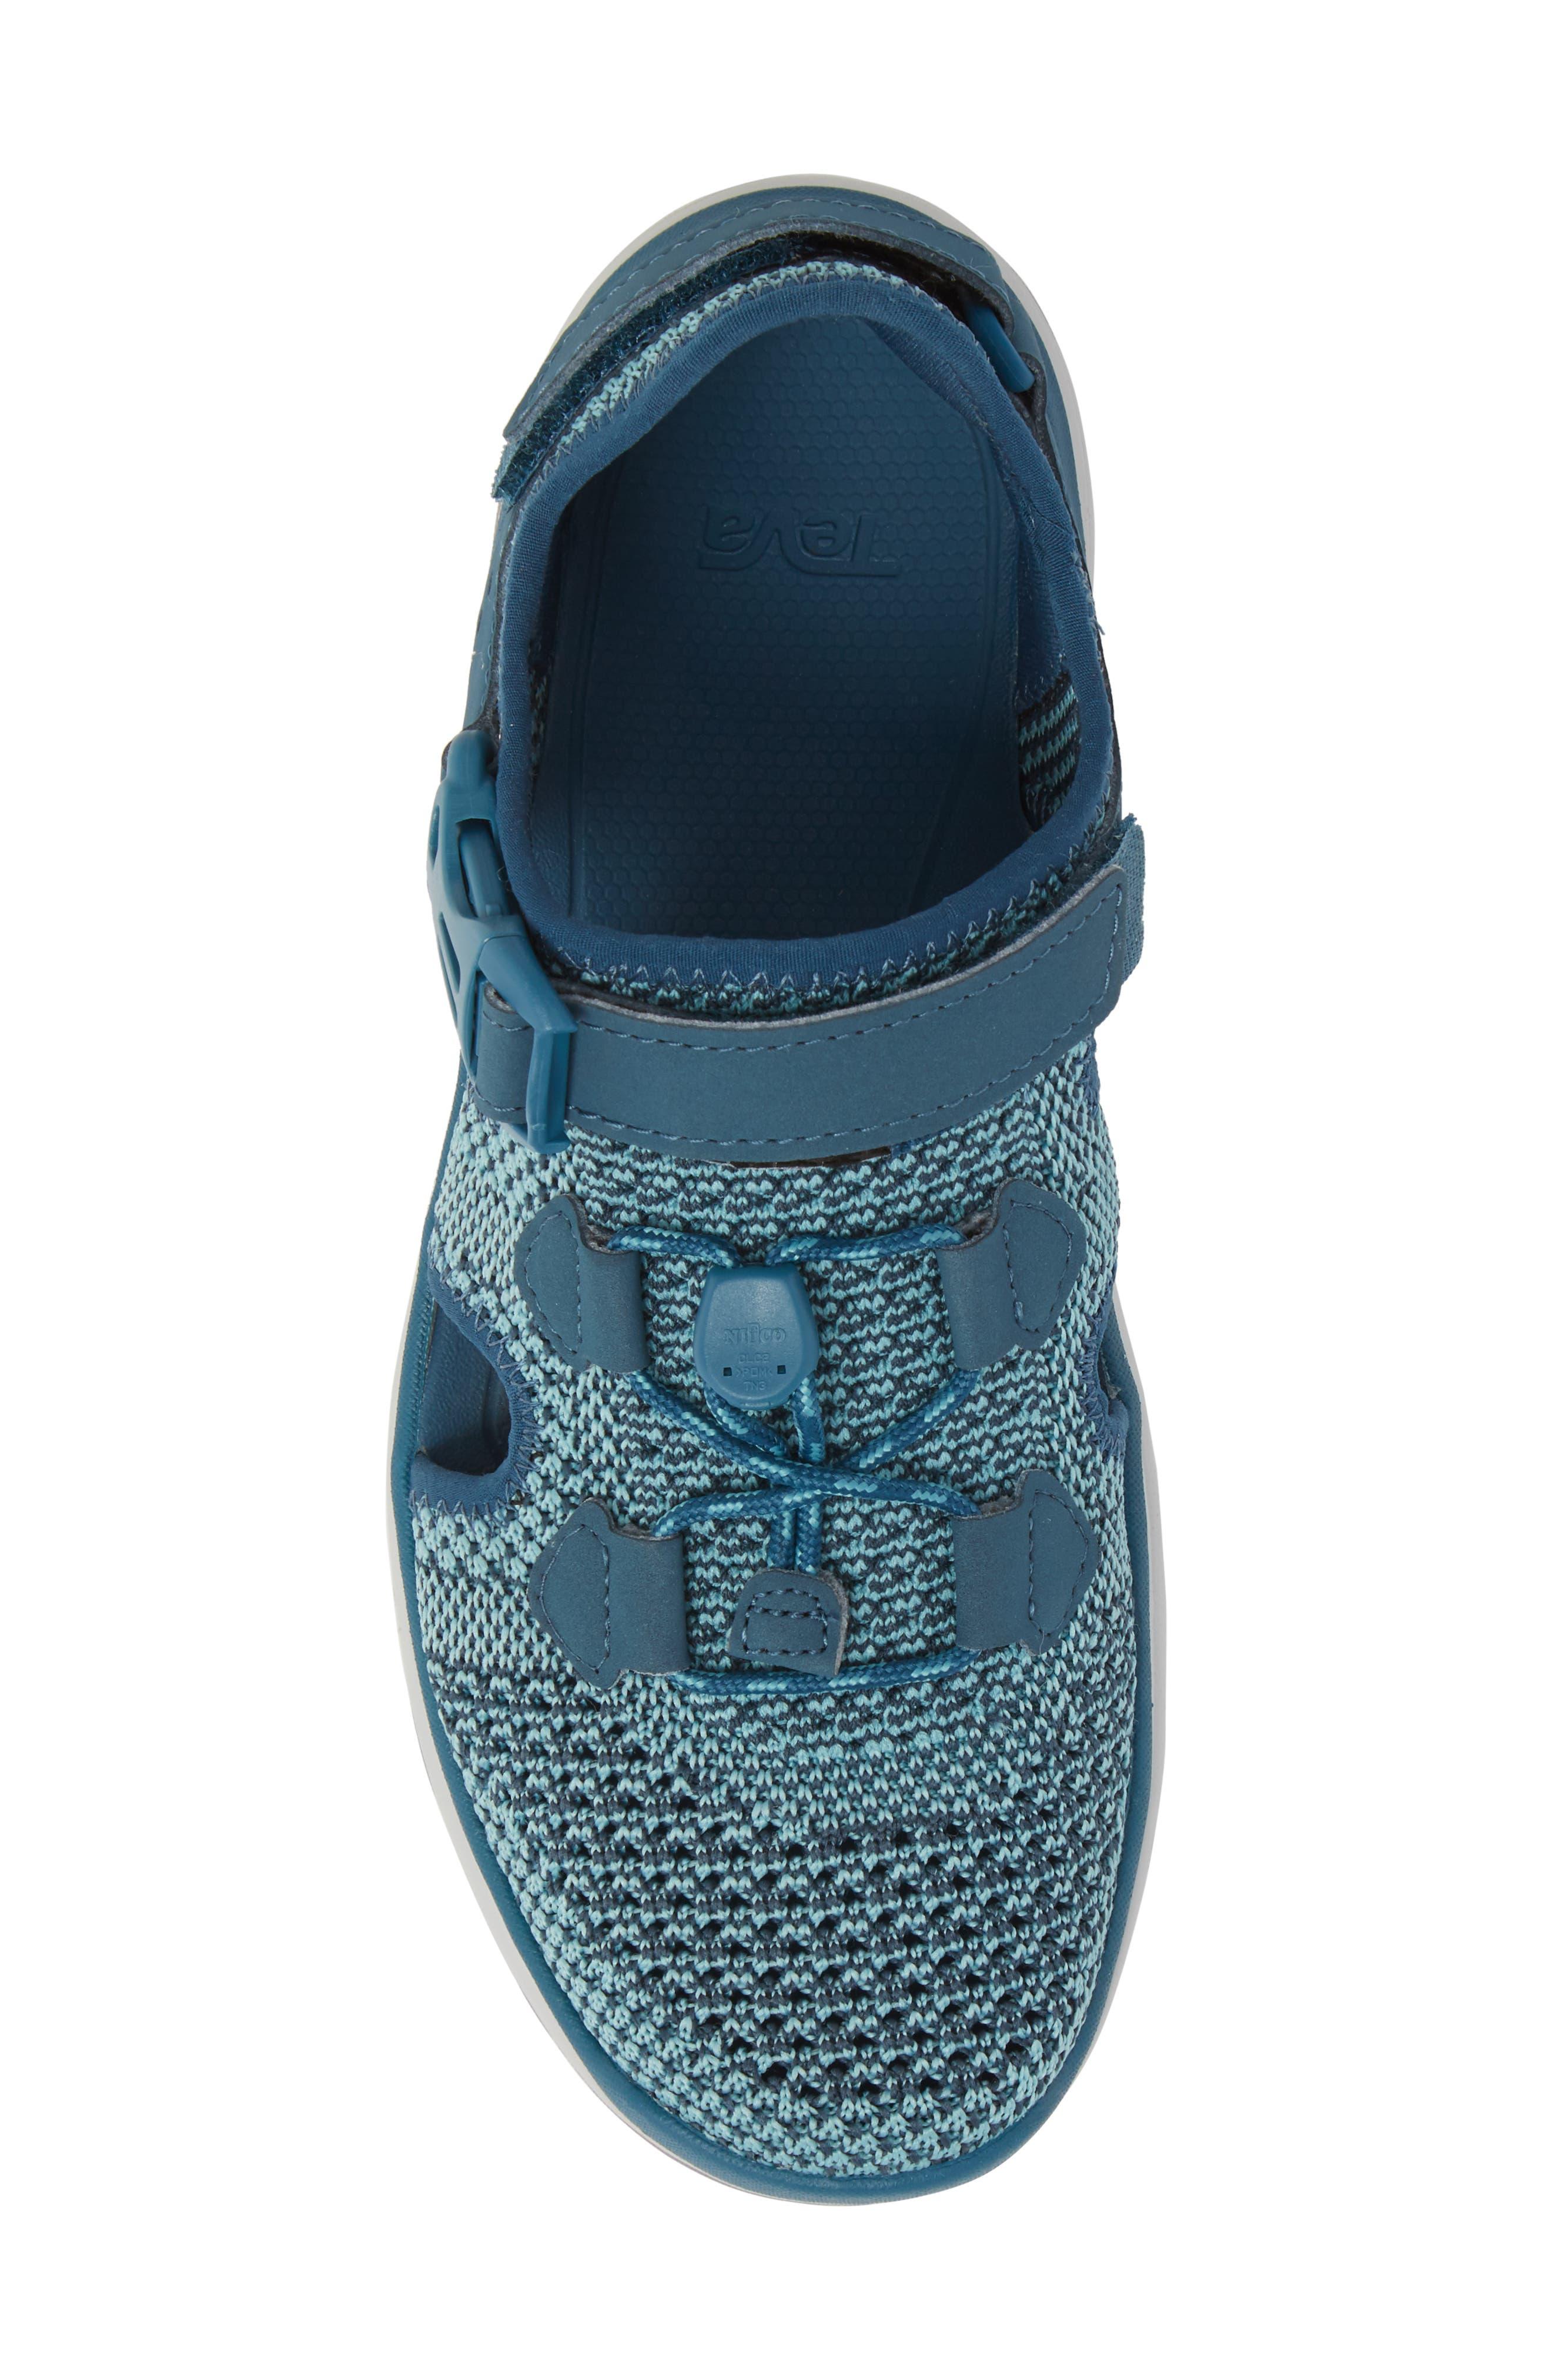 Terra Float Travel Knit Active Sandal,                             Alternate thumbnail 5, color,                             LEGION BLUE